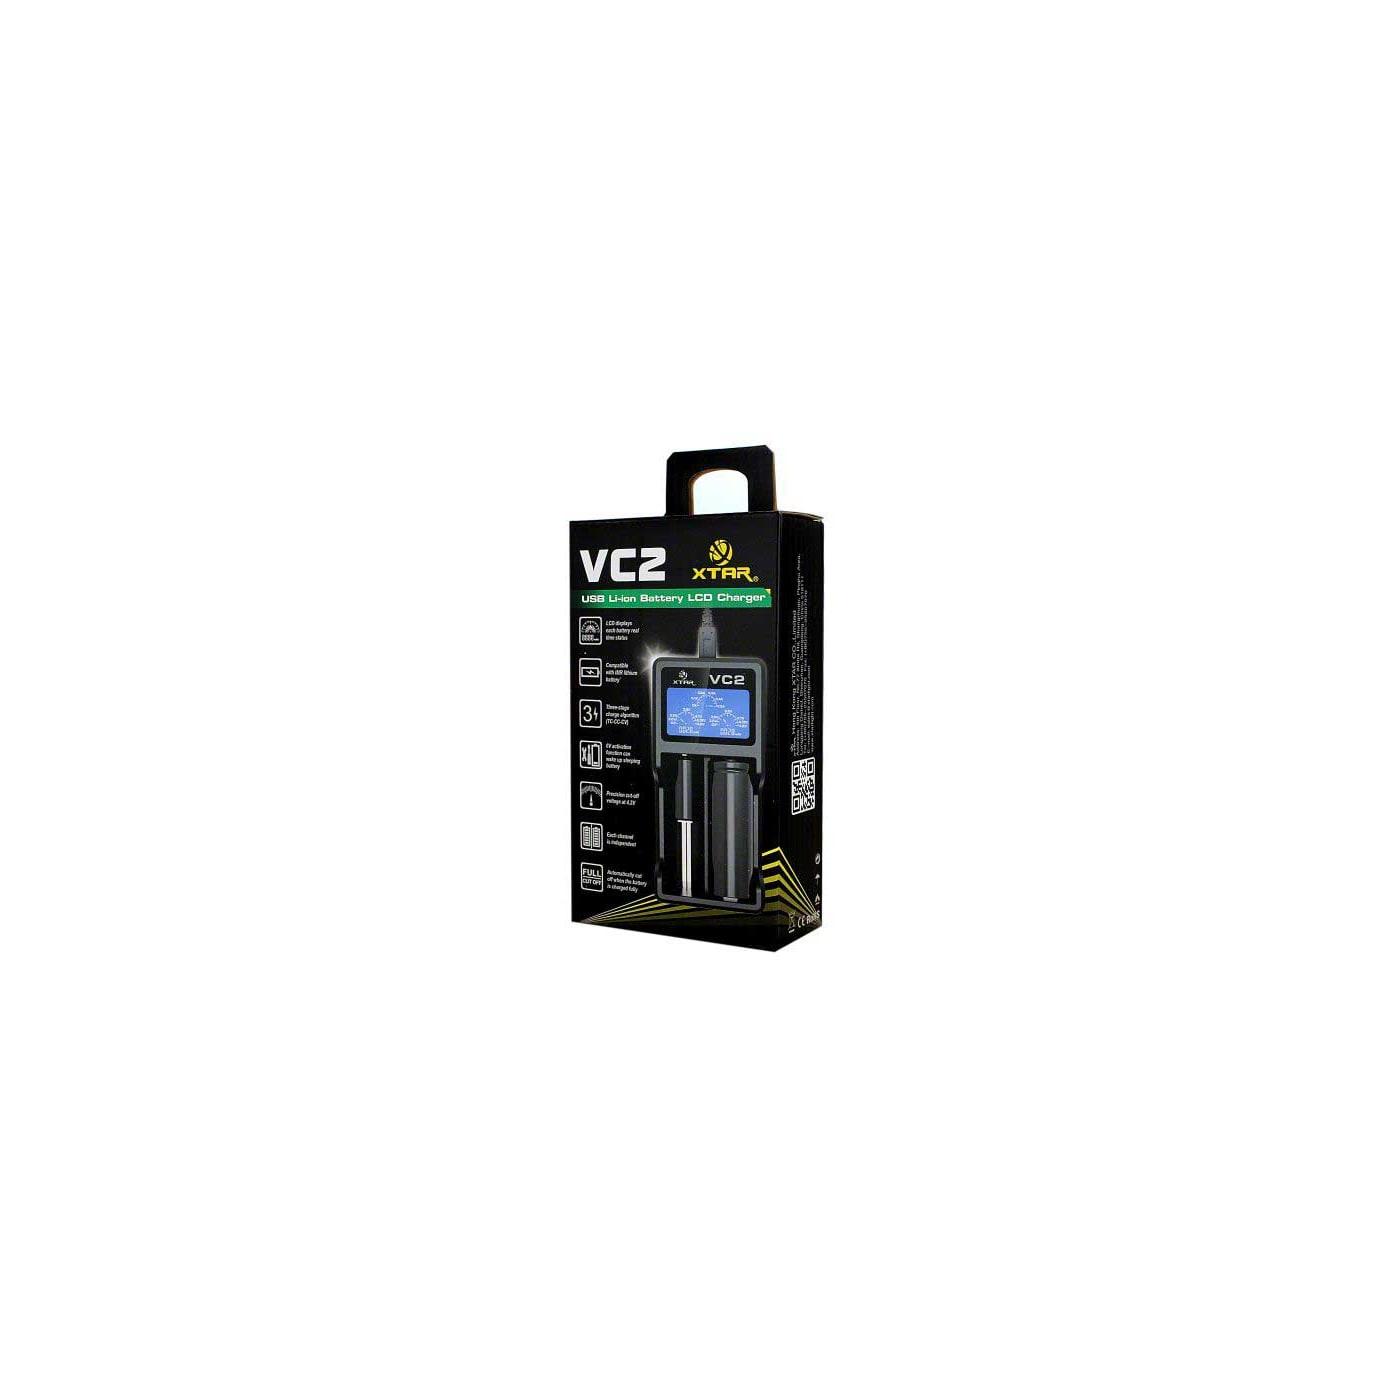 XTAR VC2 Battery Charger Box